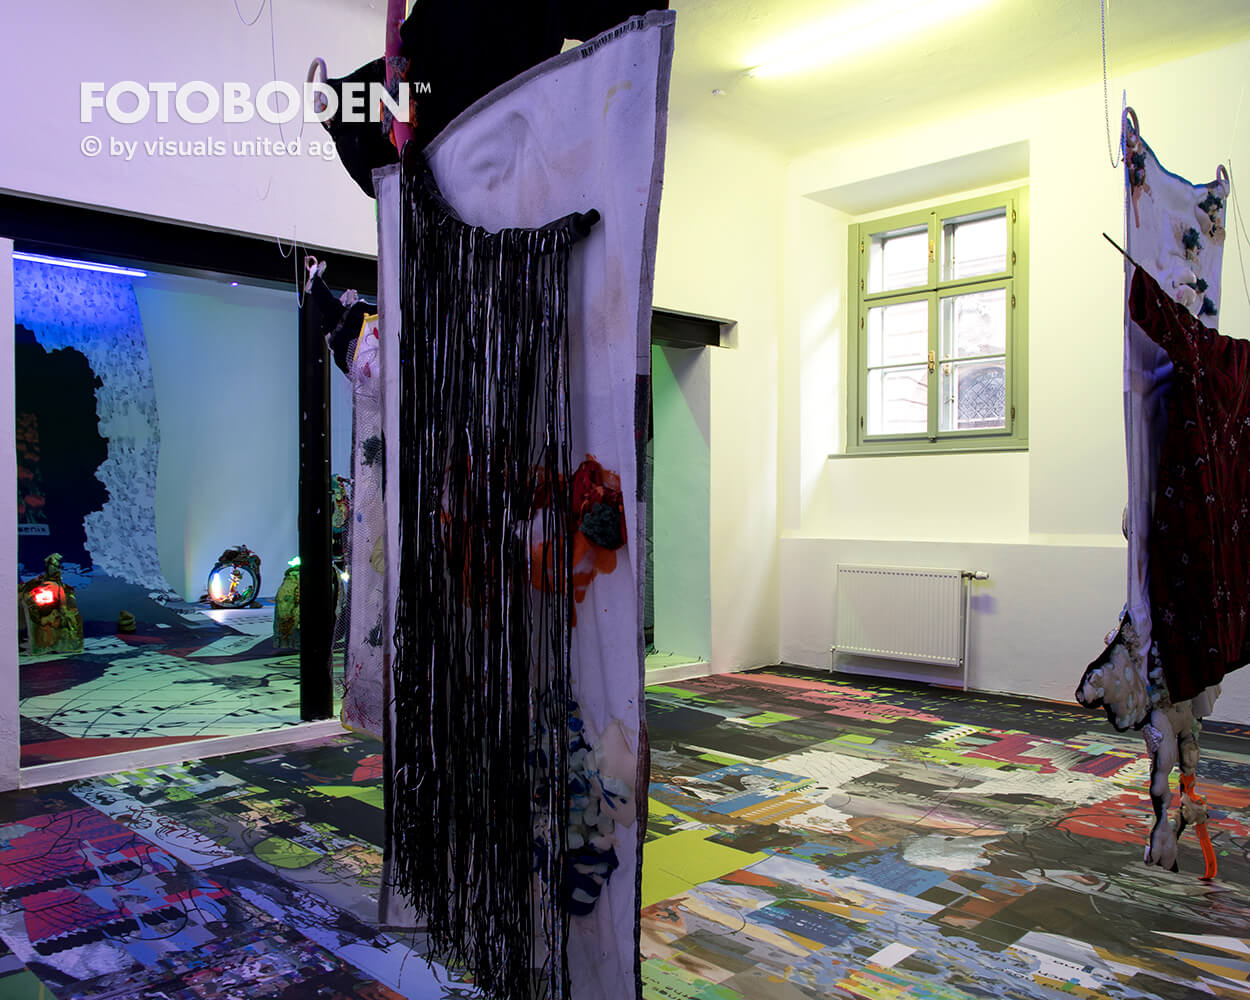 Boden bedrucken Bodengestaltung Fotoboden